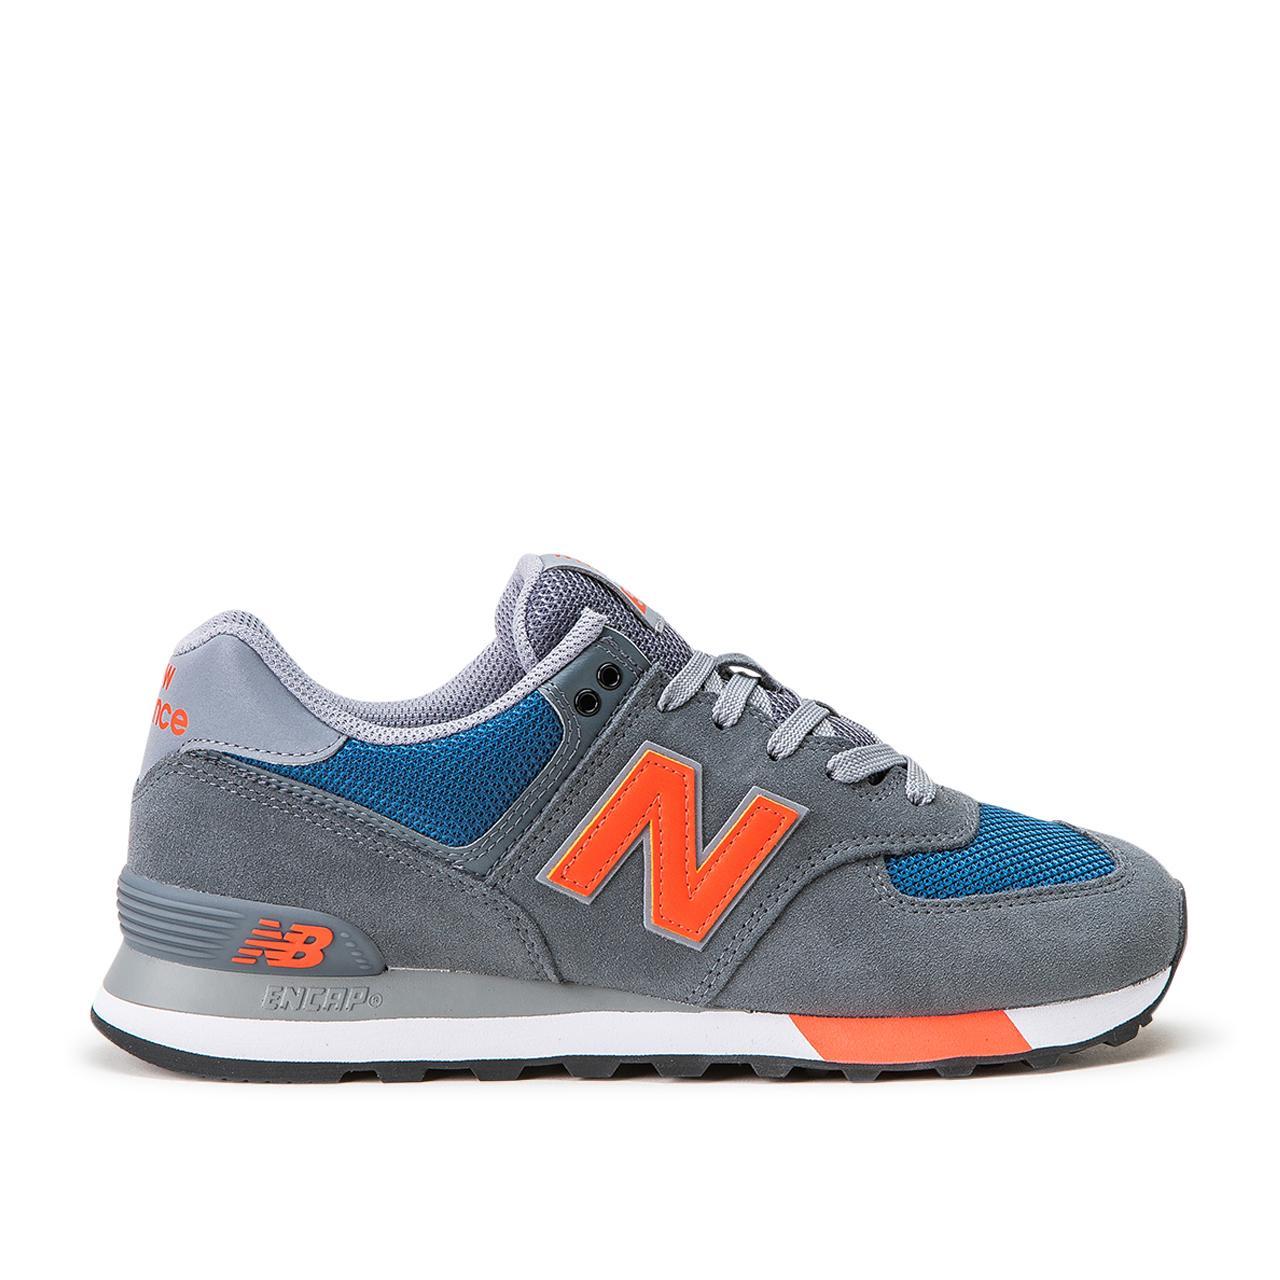 pretty nice 843c3 1fa86 New Balance ML574 NFO (Grau / Blau / Rot) (738191-60-12)